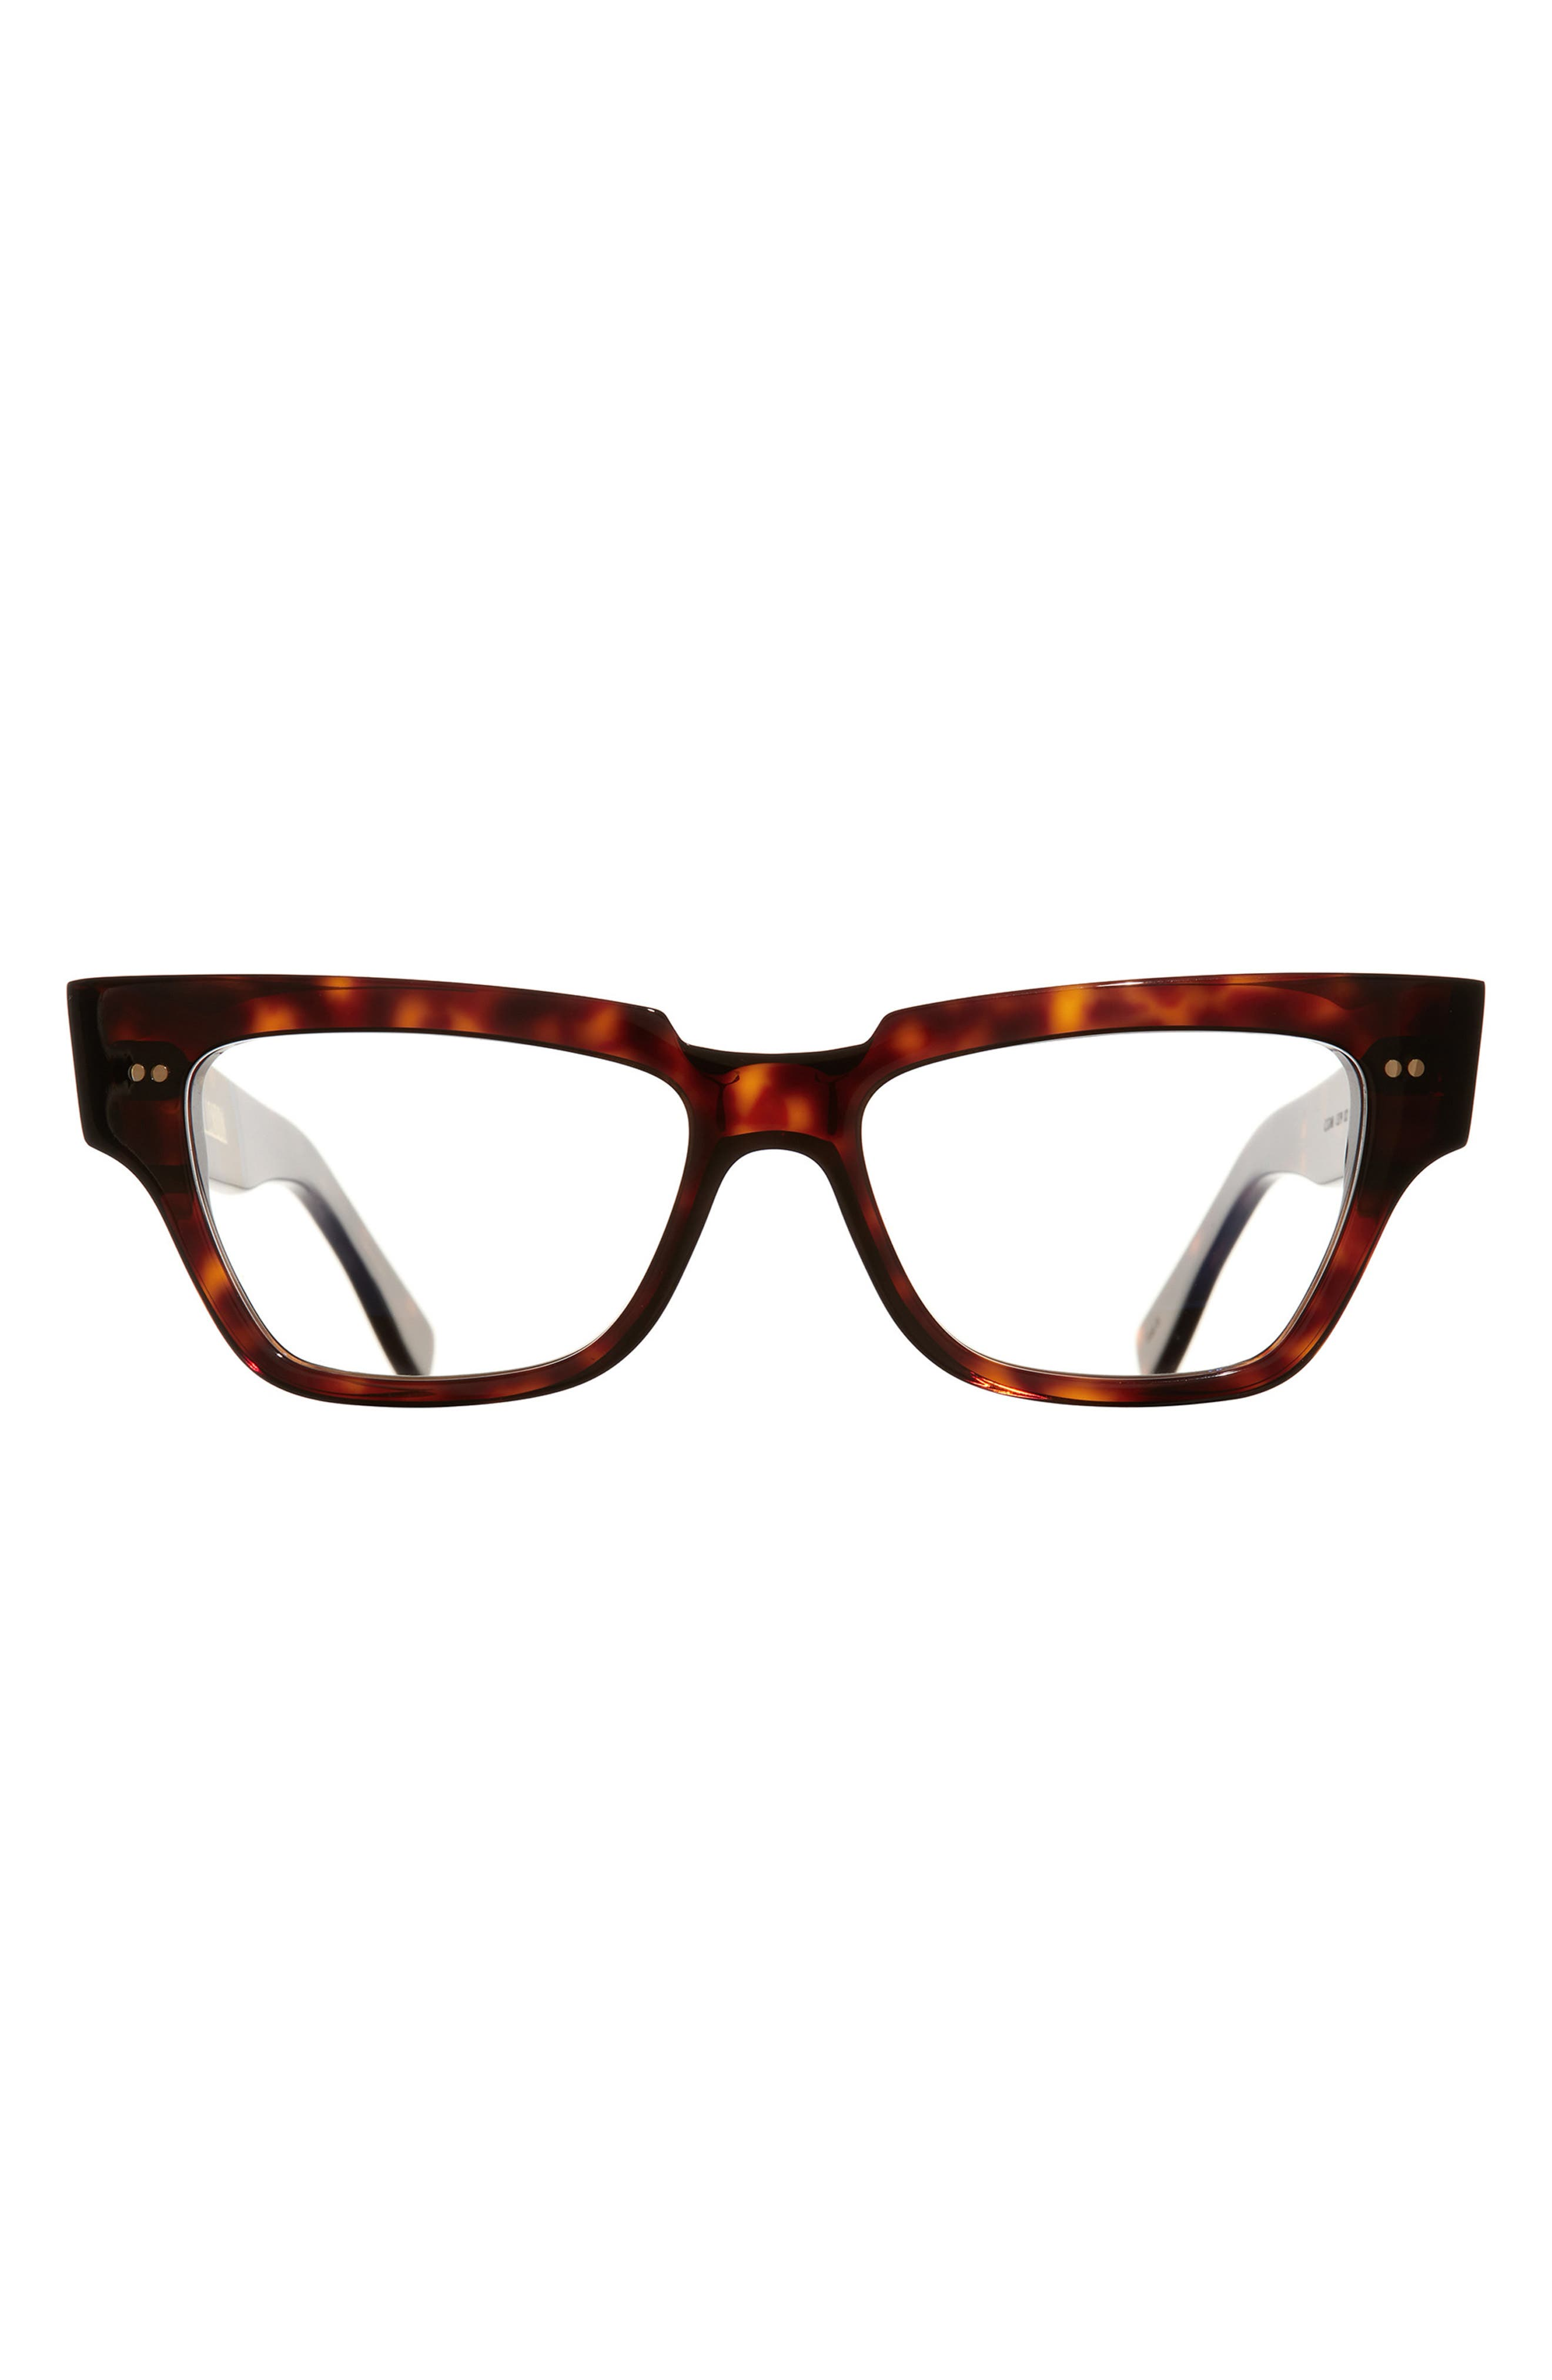 54mm Square Blue Light Blocking Glasses